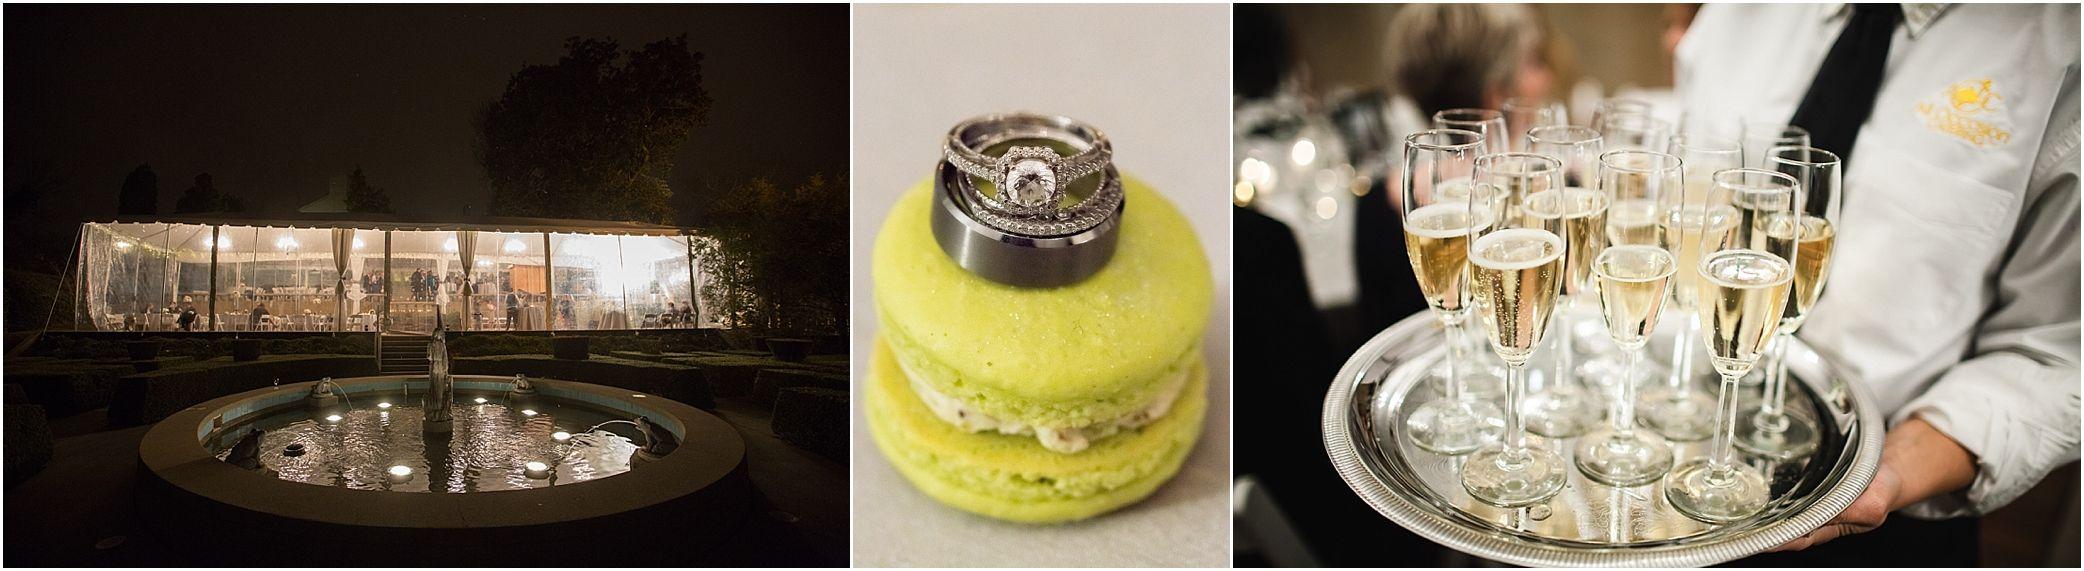 night wedding, champagne, macaron, Crescent Bend wedding, Knoxville wedding, winter wedding, vintage wedding, Crescent Bend Knoxville TN, JoPhoto, www.JoPhotoOnline.com/blog